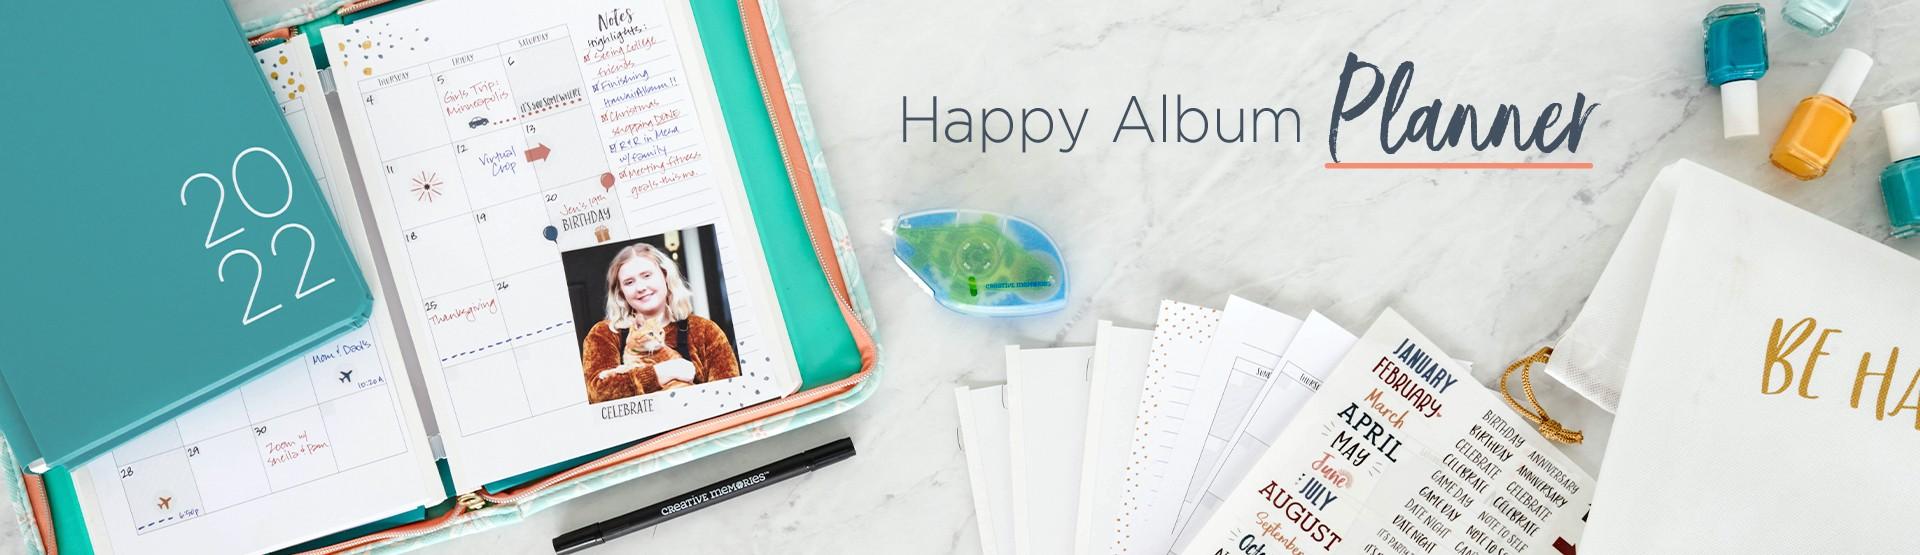 Happy Album Planner